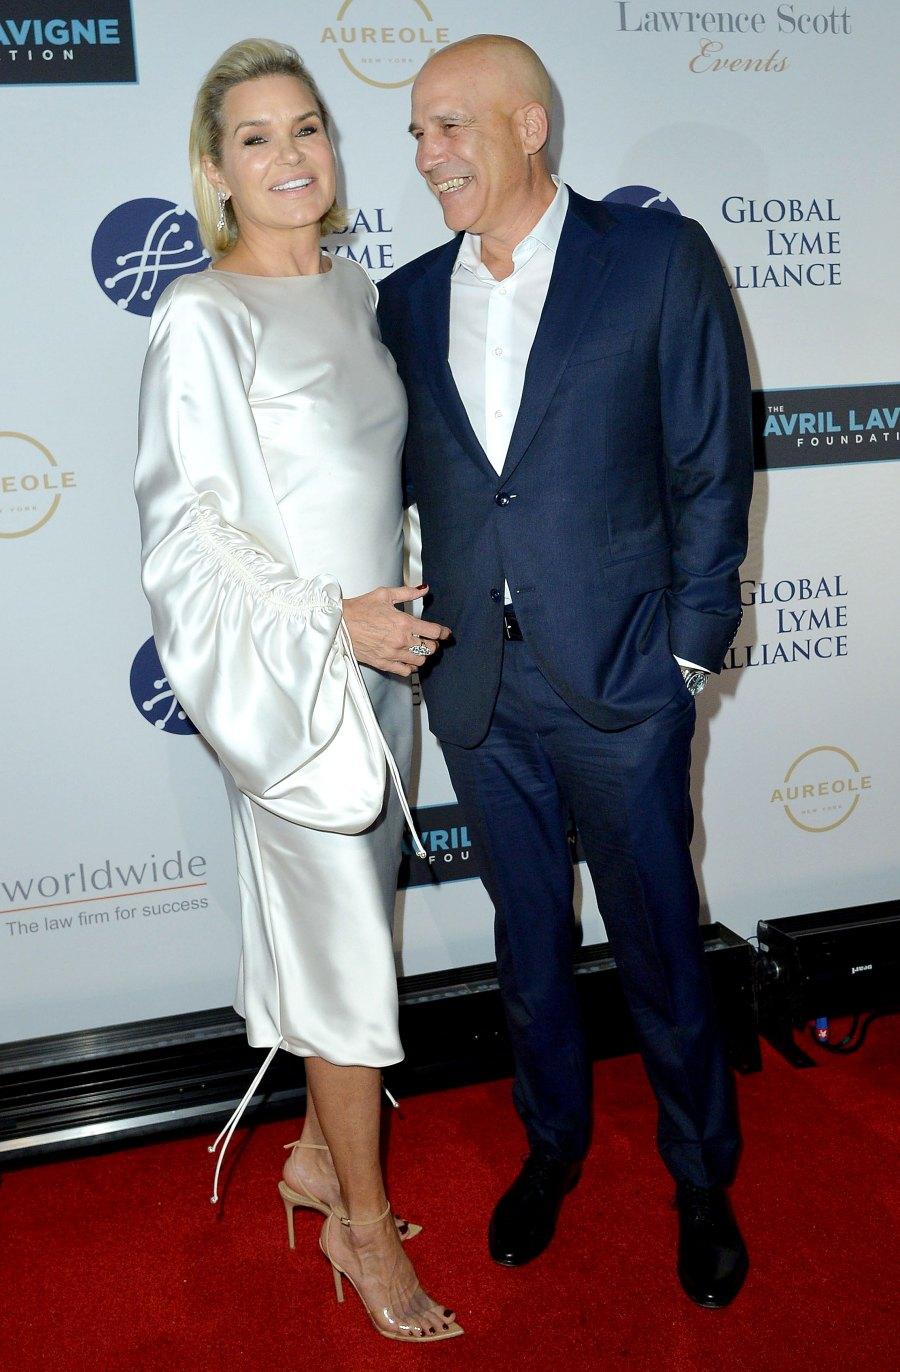 Yolanda Hadid Boyfriend Joseph Jingoli Make Their Red Carpet Debut